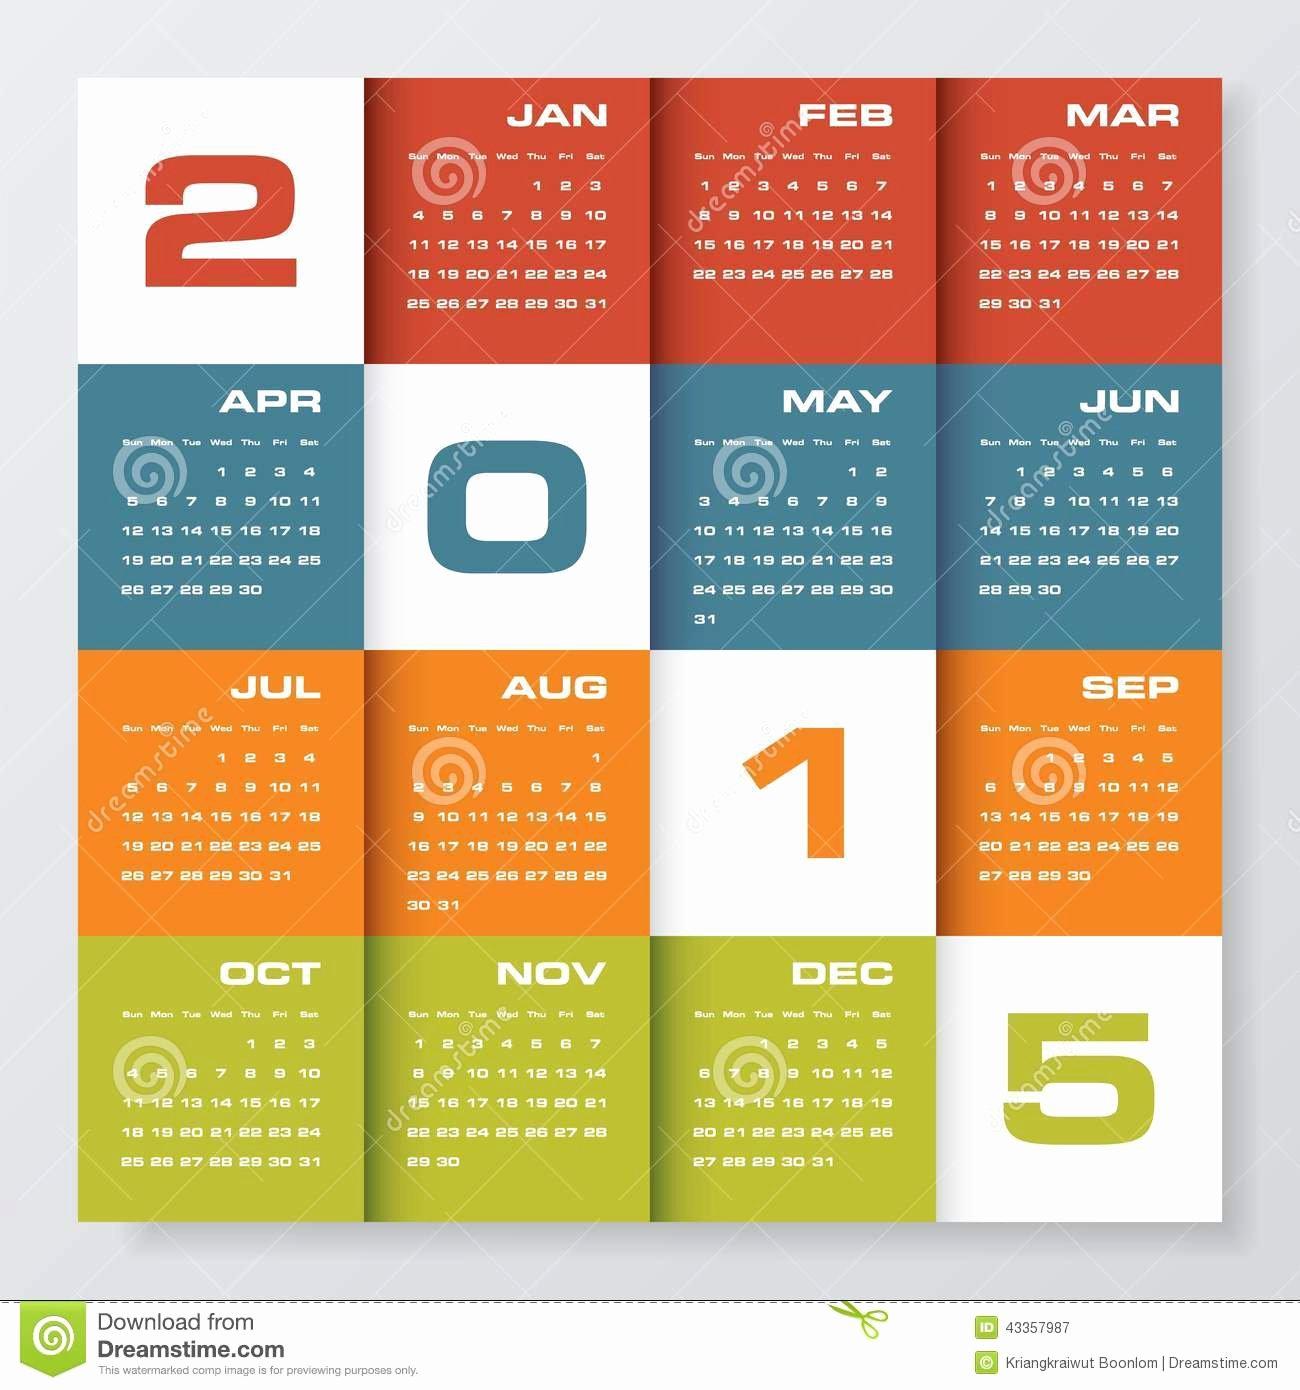 Event Calendar Template for Website Awesome Simple Editable Vector Calendar 2015 Stock Vector Image